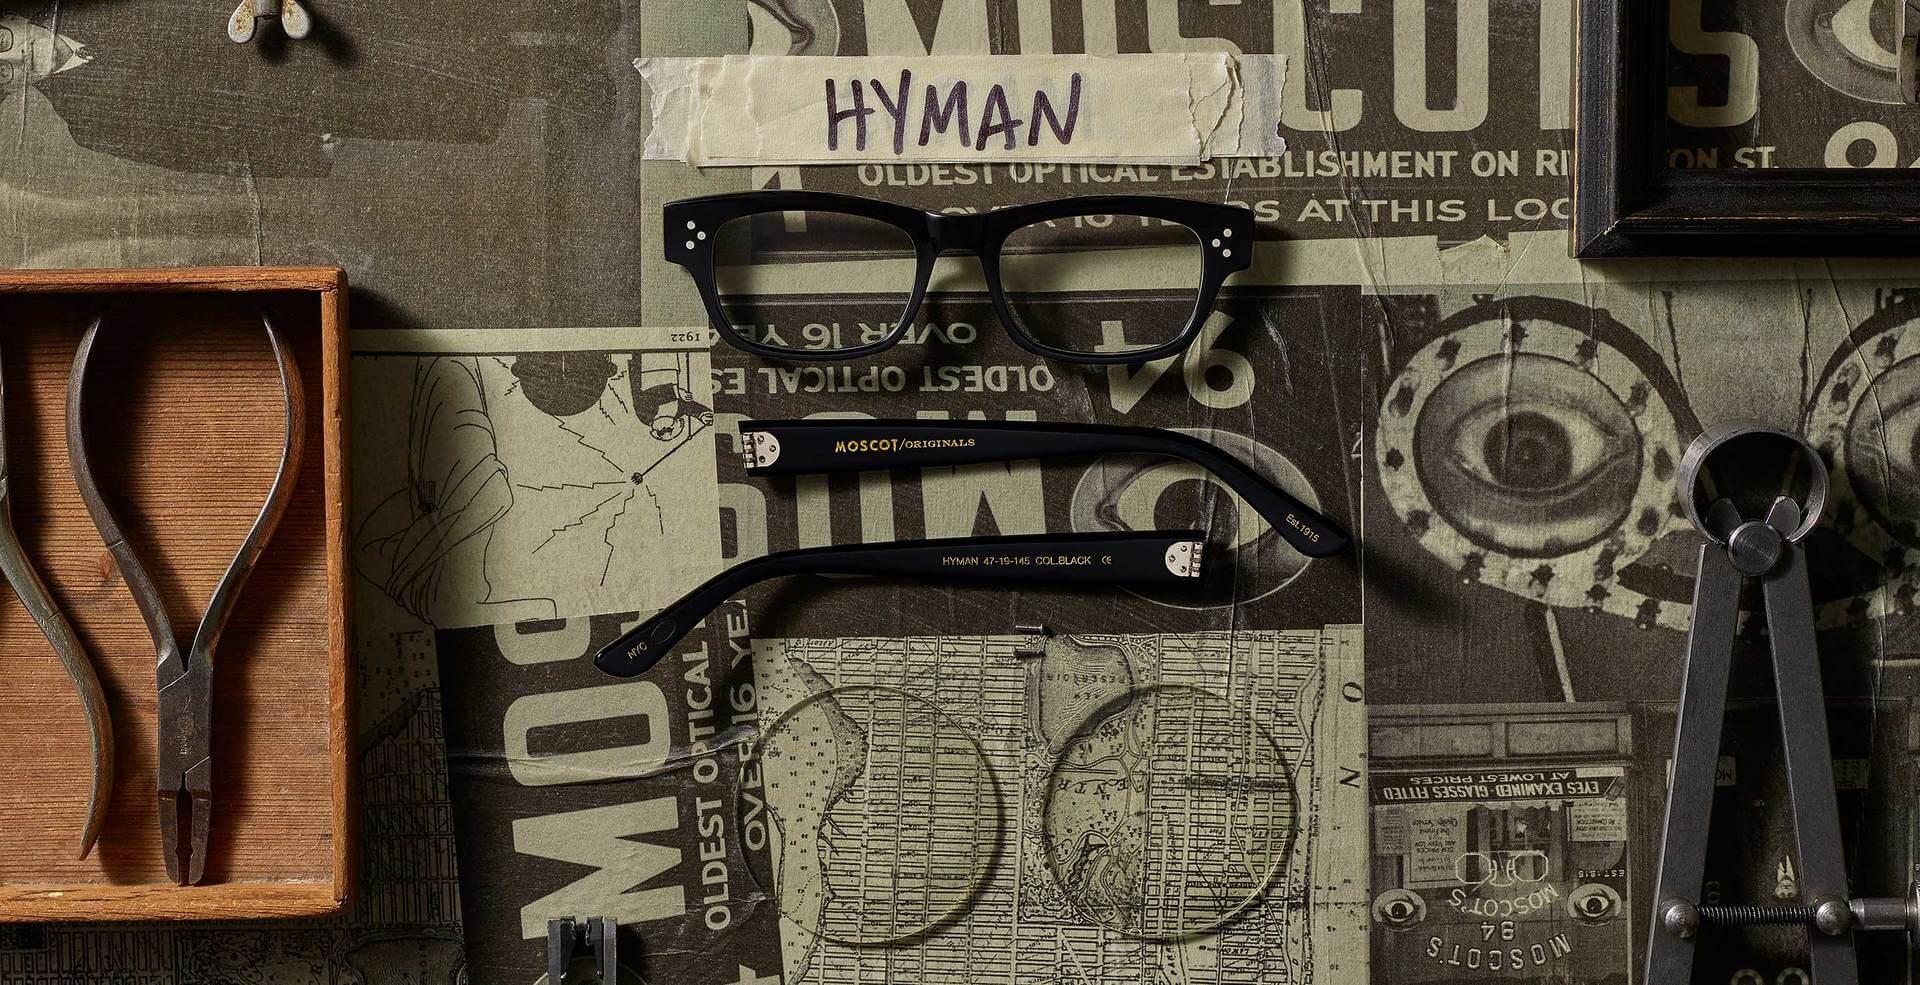 HYMAN